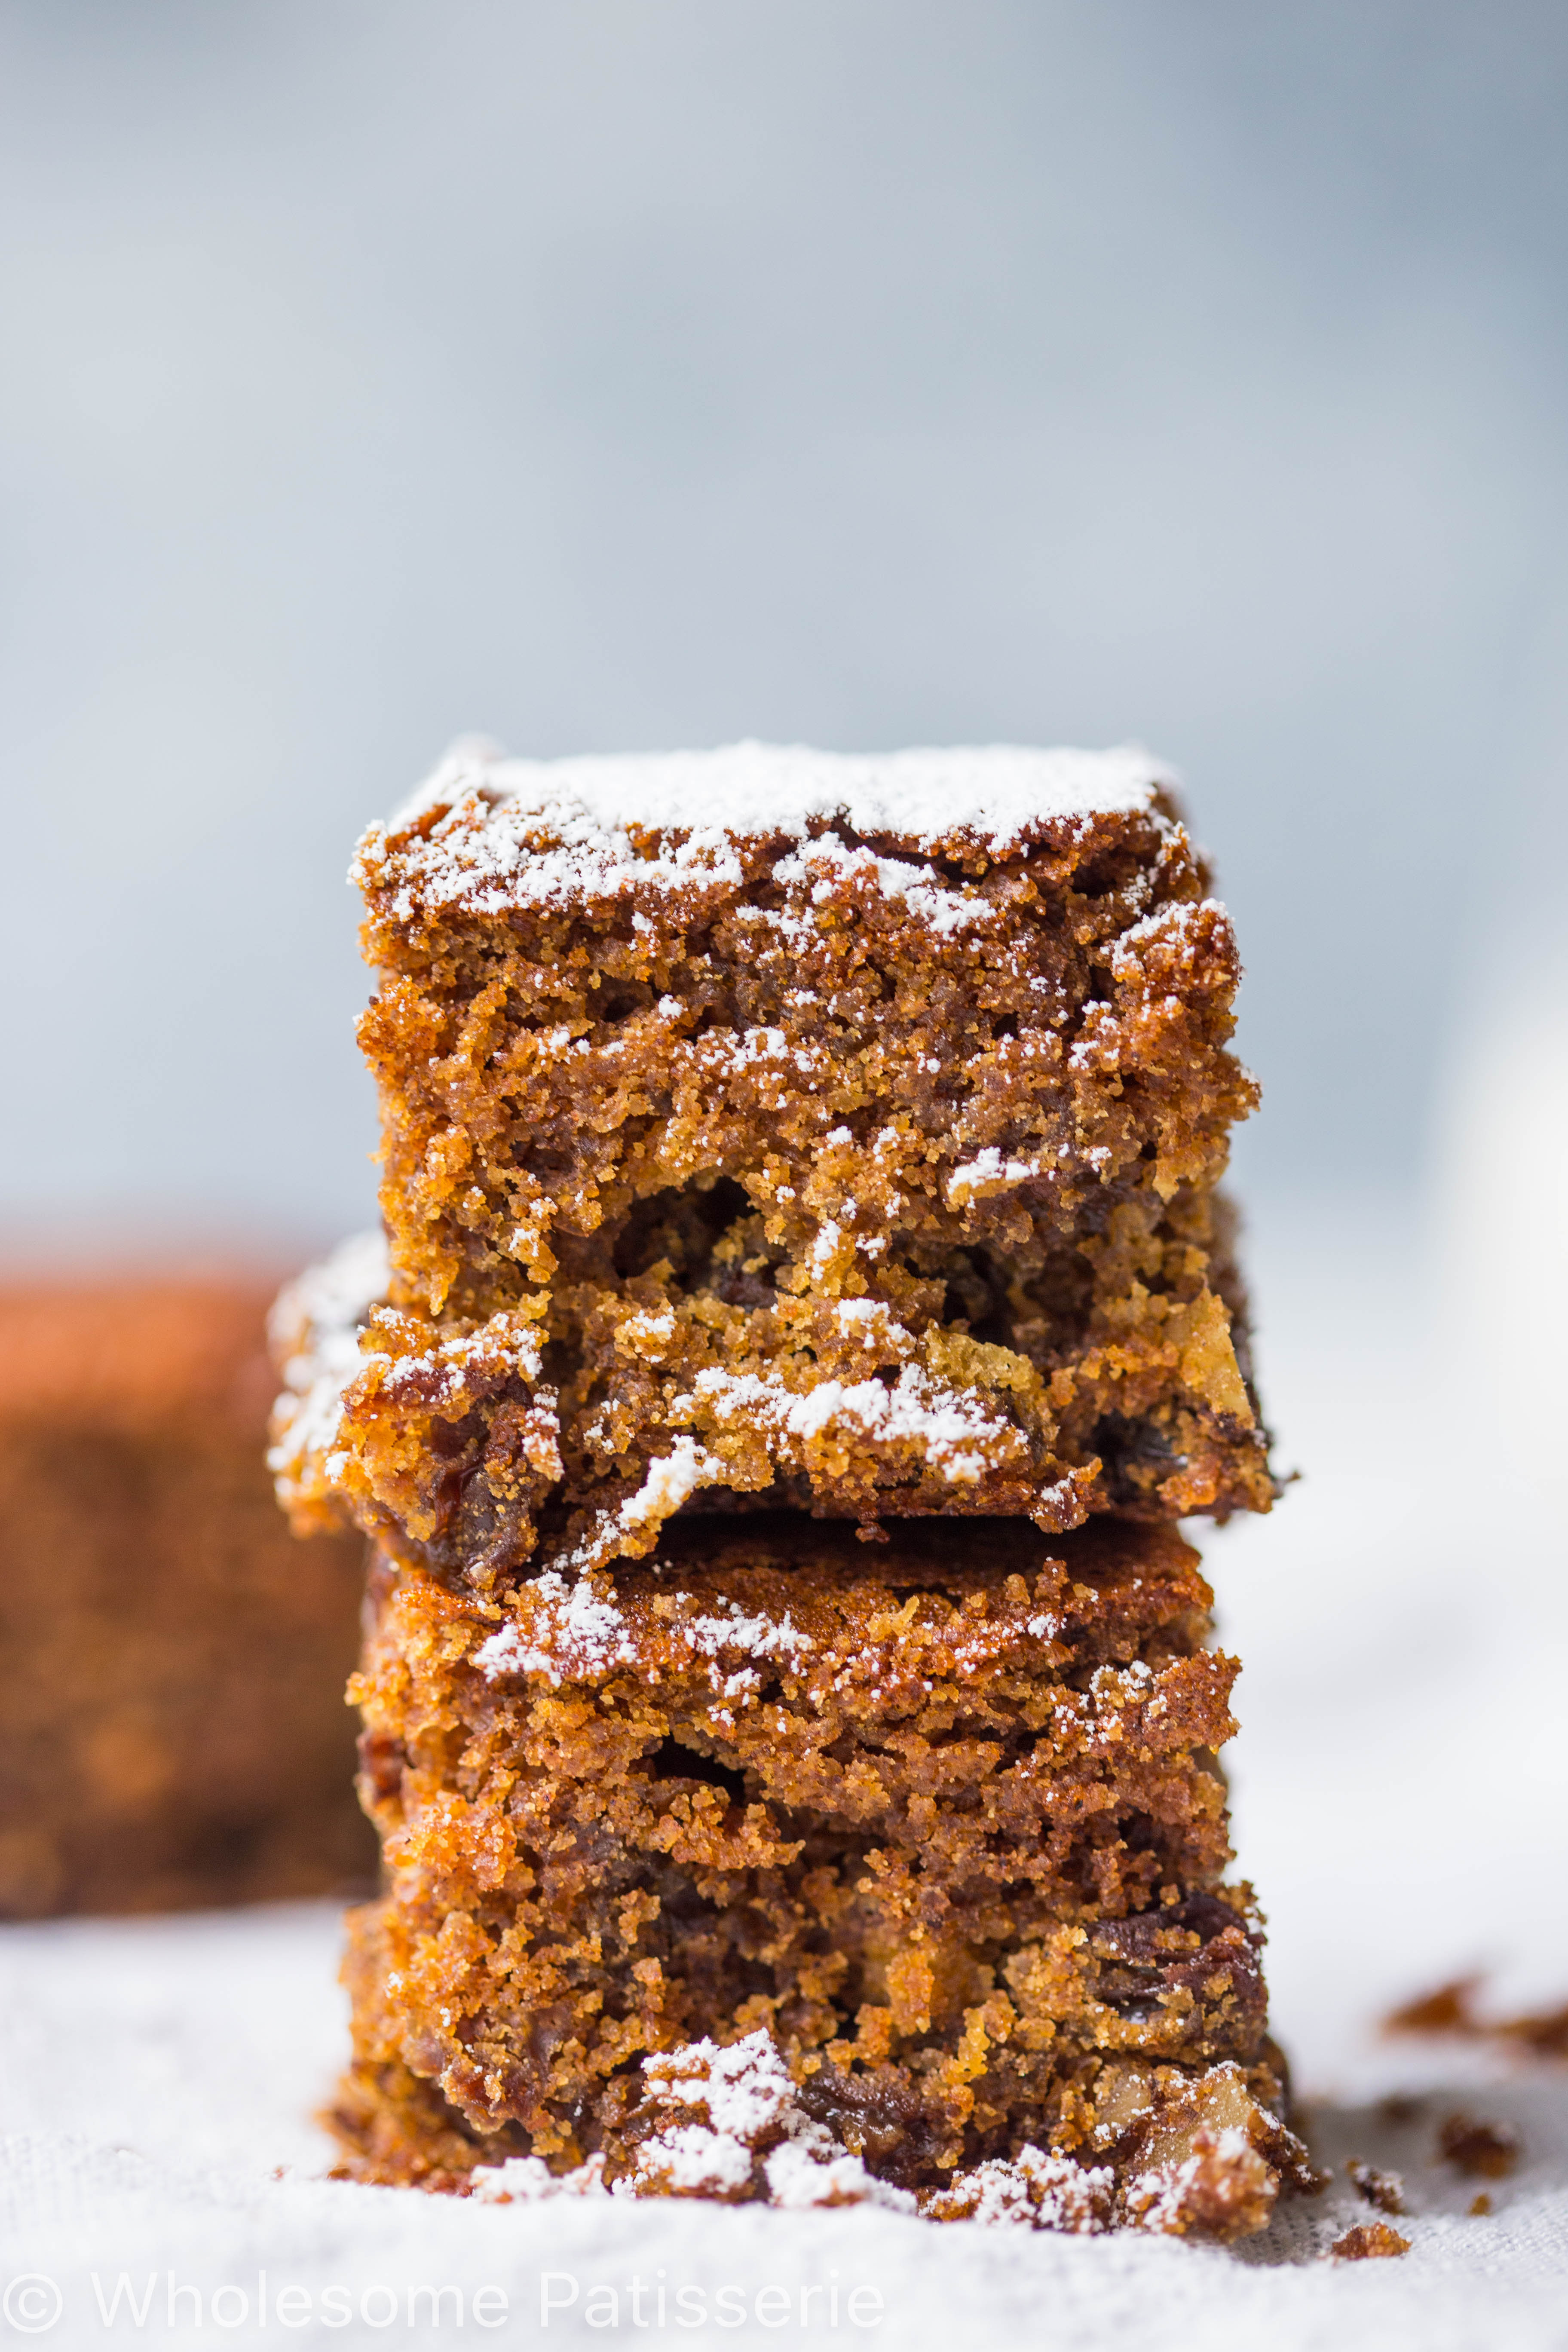 gluten-free-raisin-walnut-cake-loaf-delicious-fruit-cake-christmas-festive-the-holidays-raisin-cake